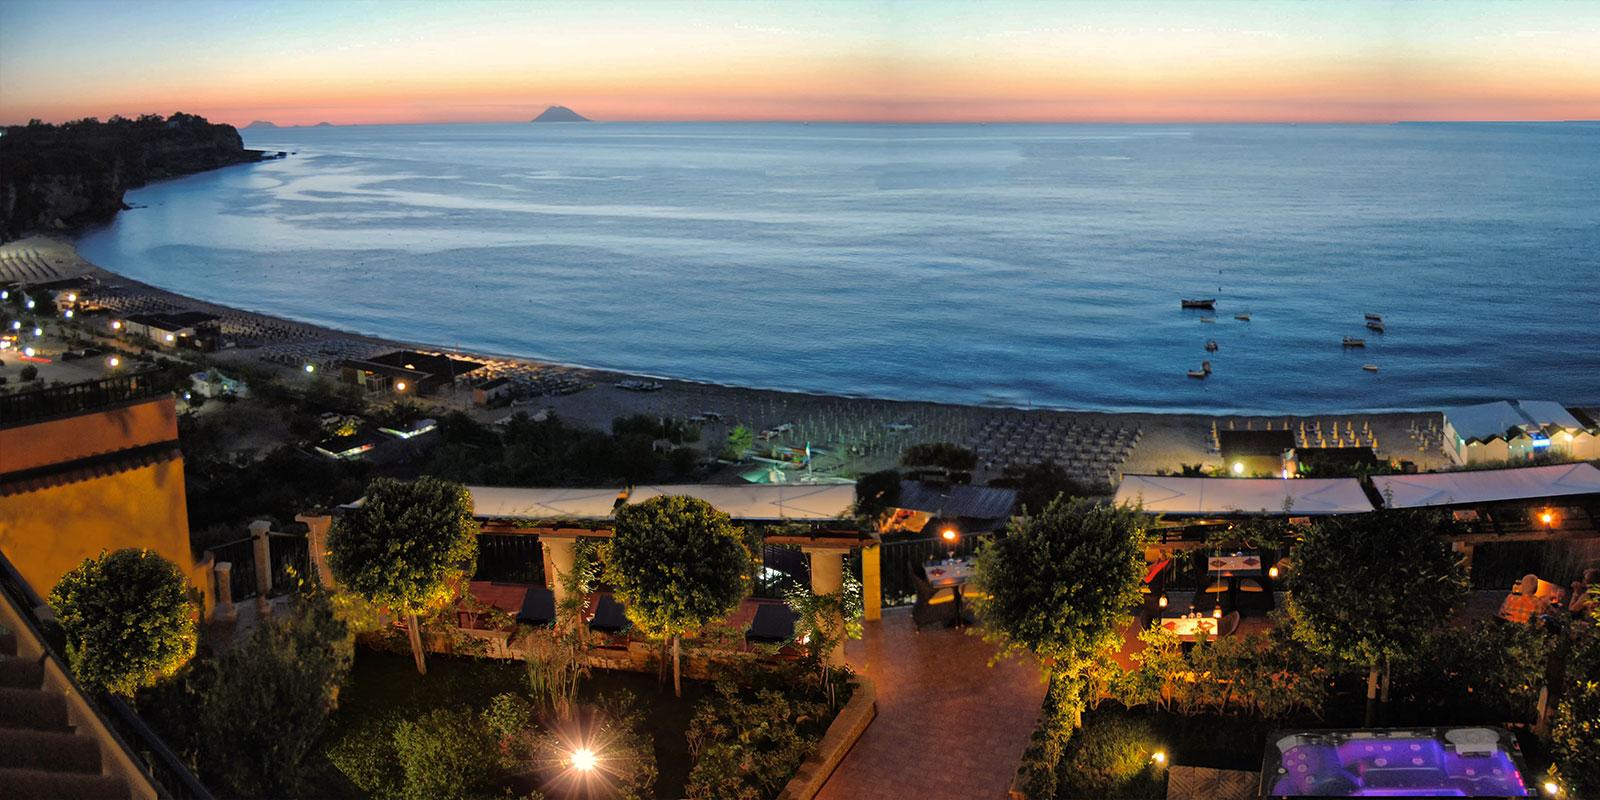 Best Hotel in Calabria close to Tropea www.allinitalian.com